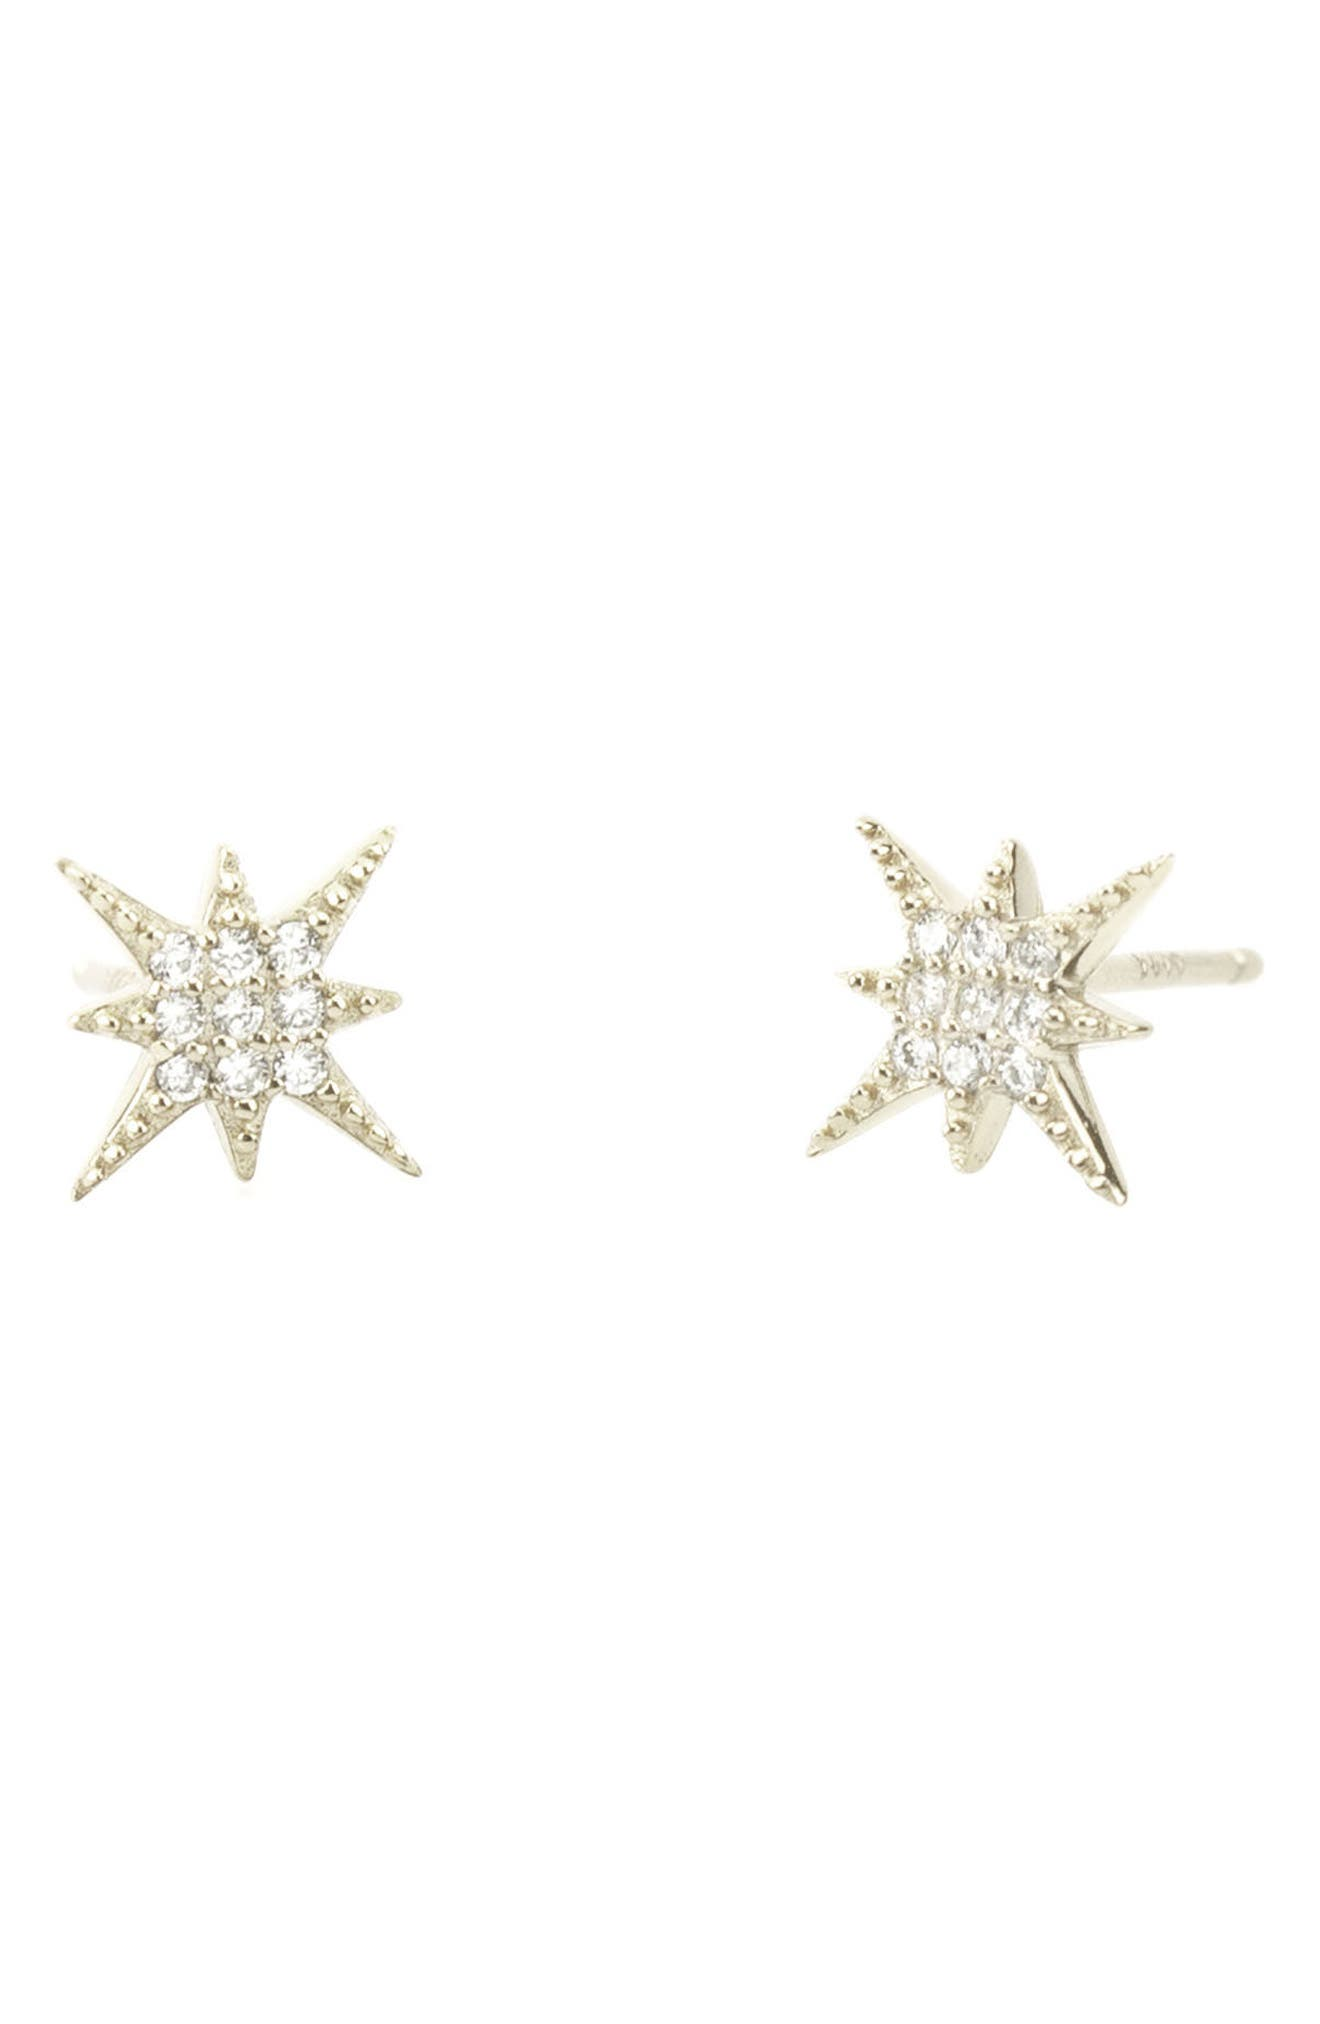 Pavé Starburst Stud Earrings,                         Main,                         color,